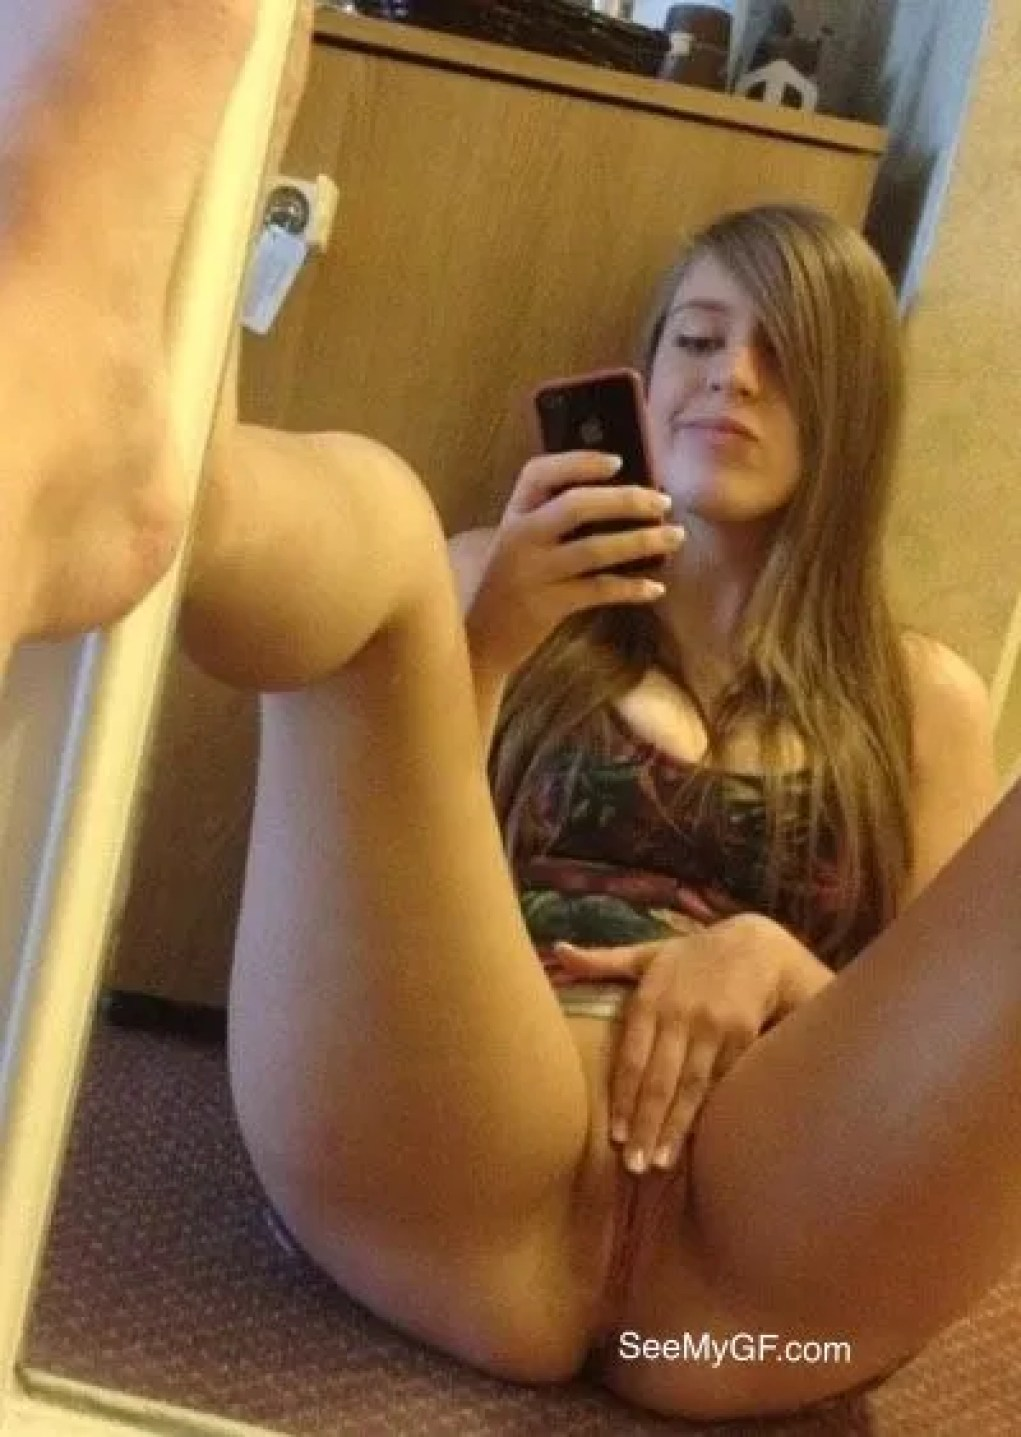 Snapchat Nudes  Seemygf  Ex Gf Porn Pics  Videos-9107